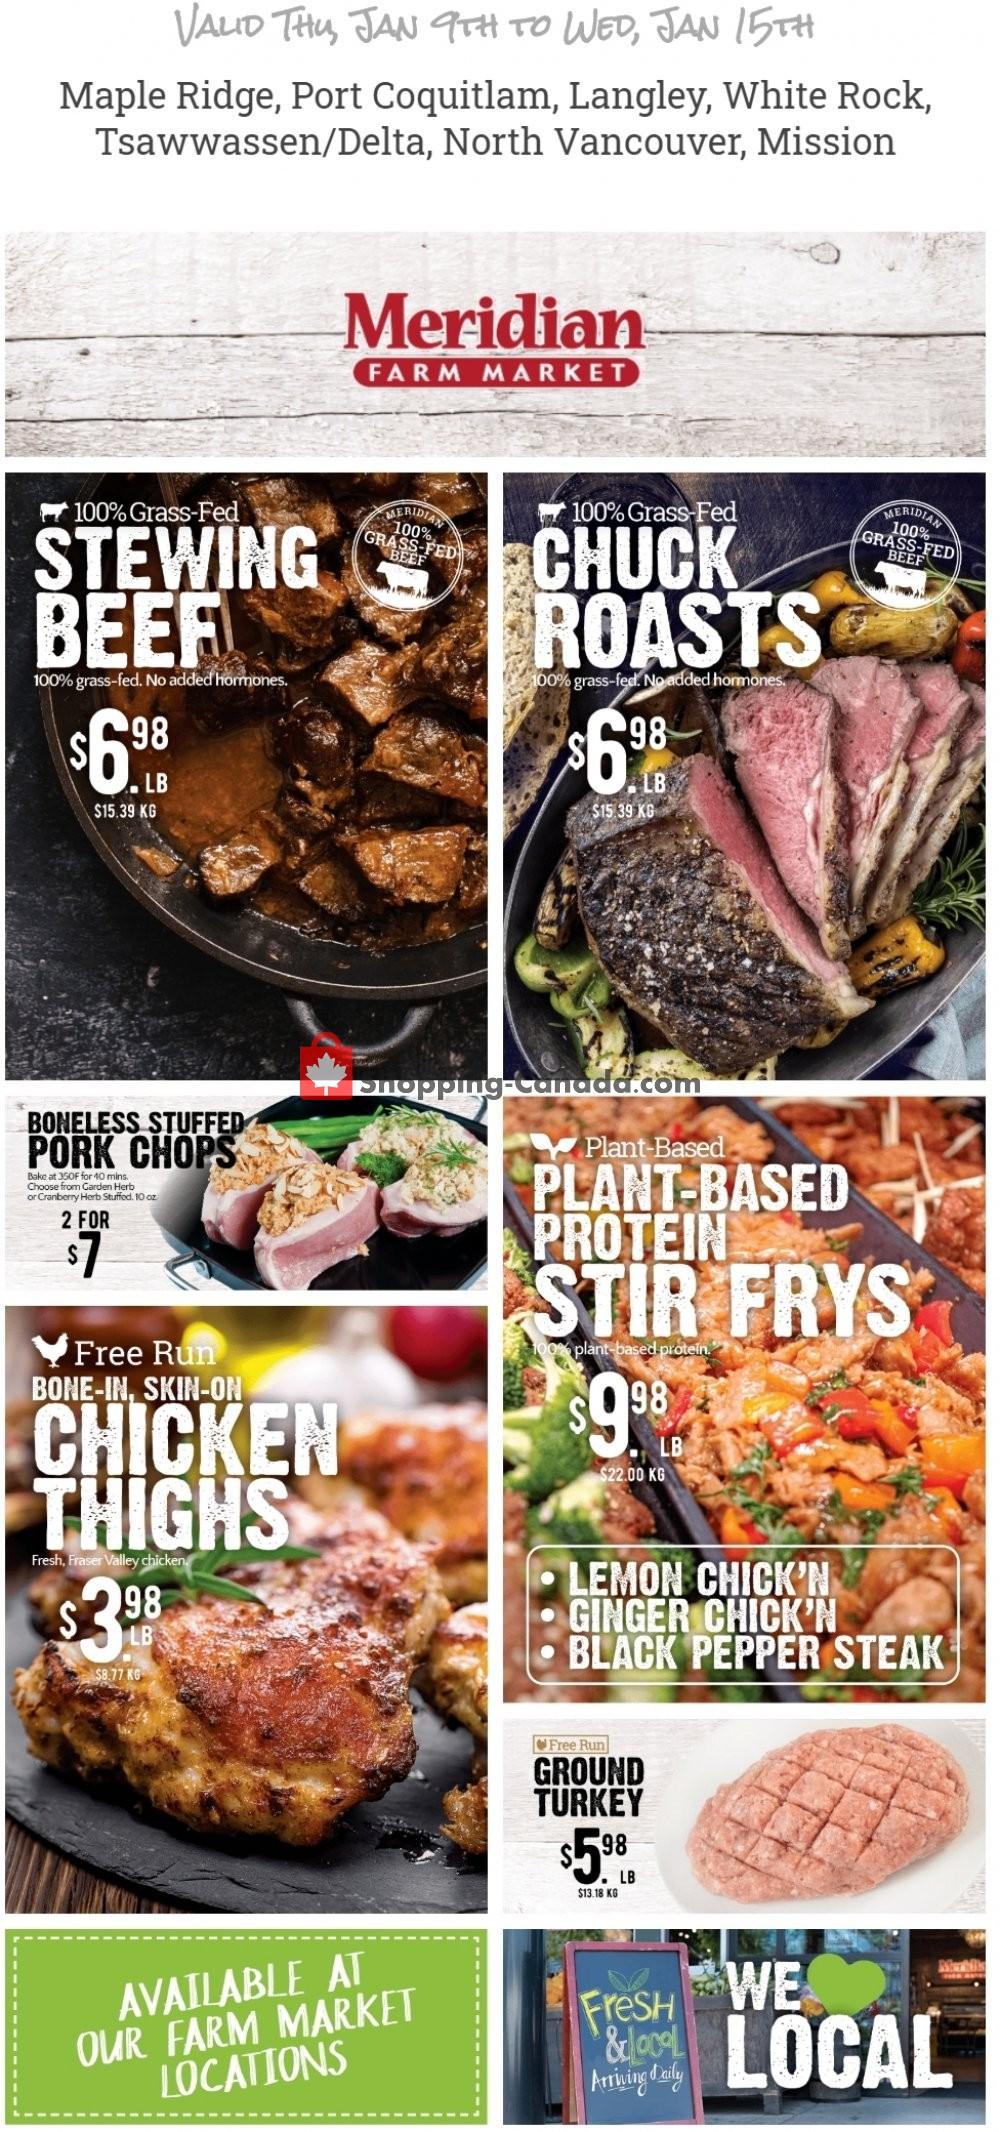 Flyer Meridian Meats & Meridian Farm Market Canada - from Thursday January 9, 2020 to Wednesday January 15, 2020